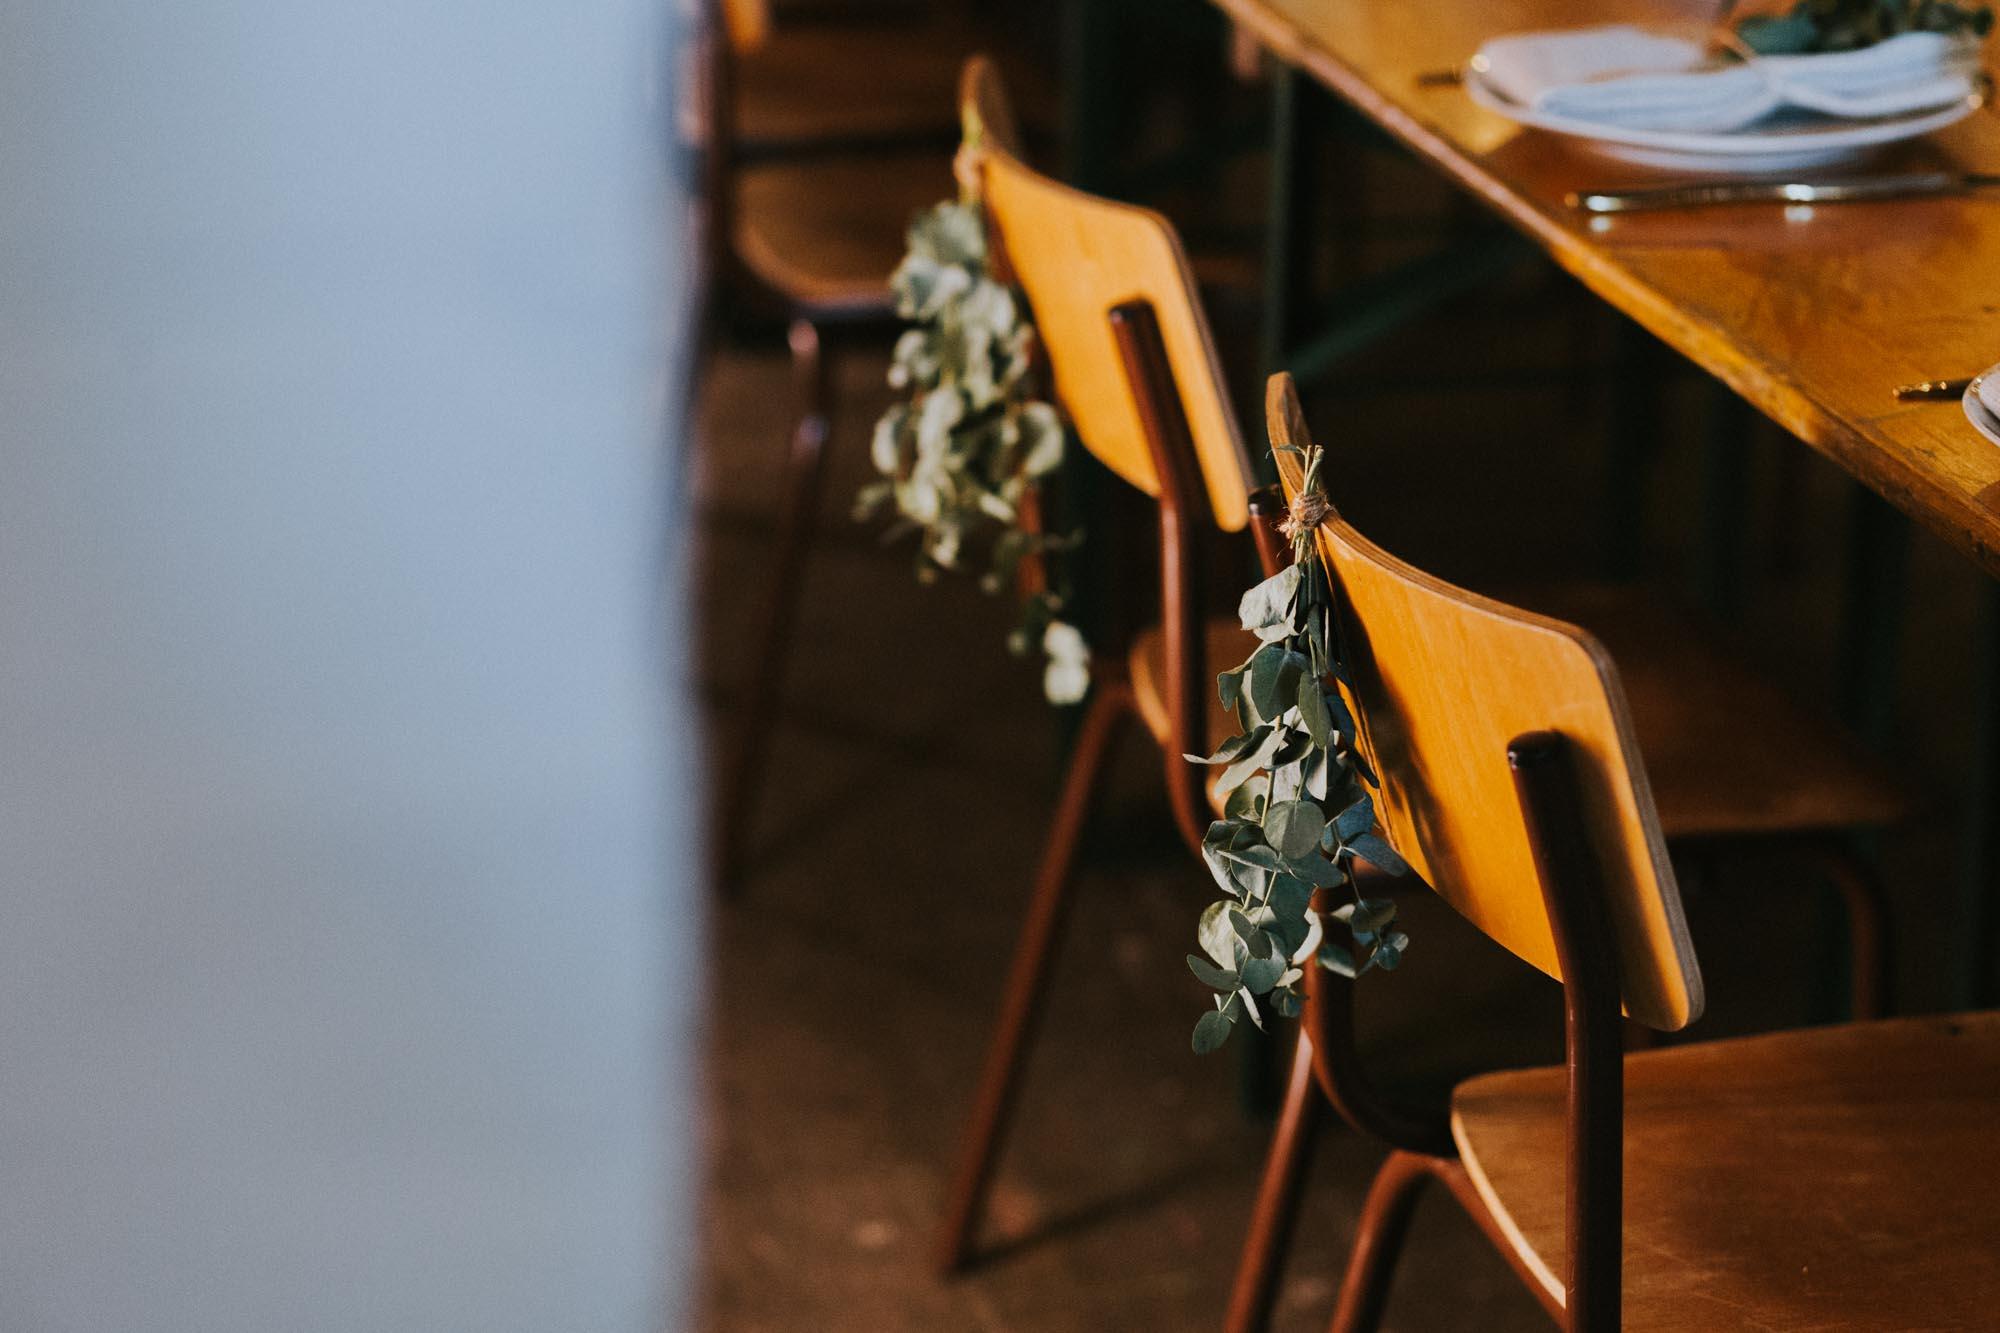 Quirky Venue, Non-traditional wedding planner, London Wedding coordination, Event Bar, Bespoke weddings, Brixton Wedding, Foodie wedding, informal, Stylish, Event Planning, London weddings